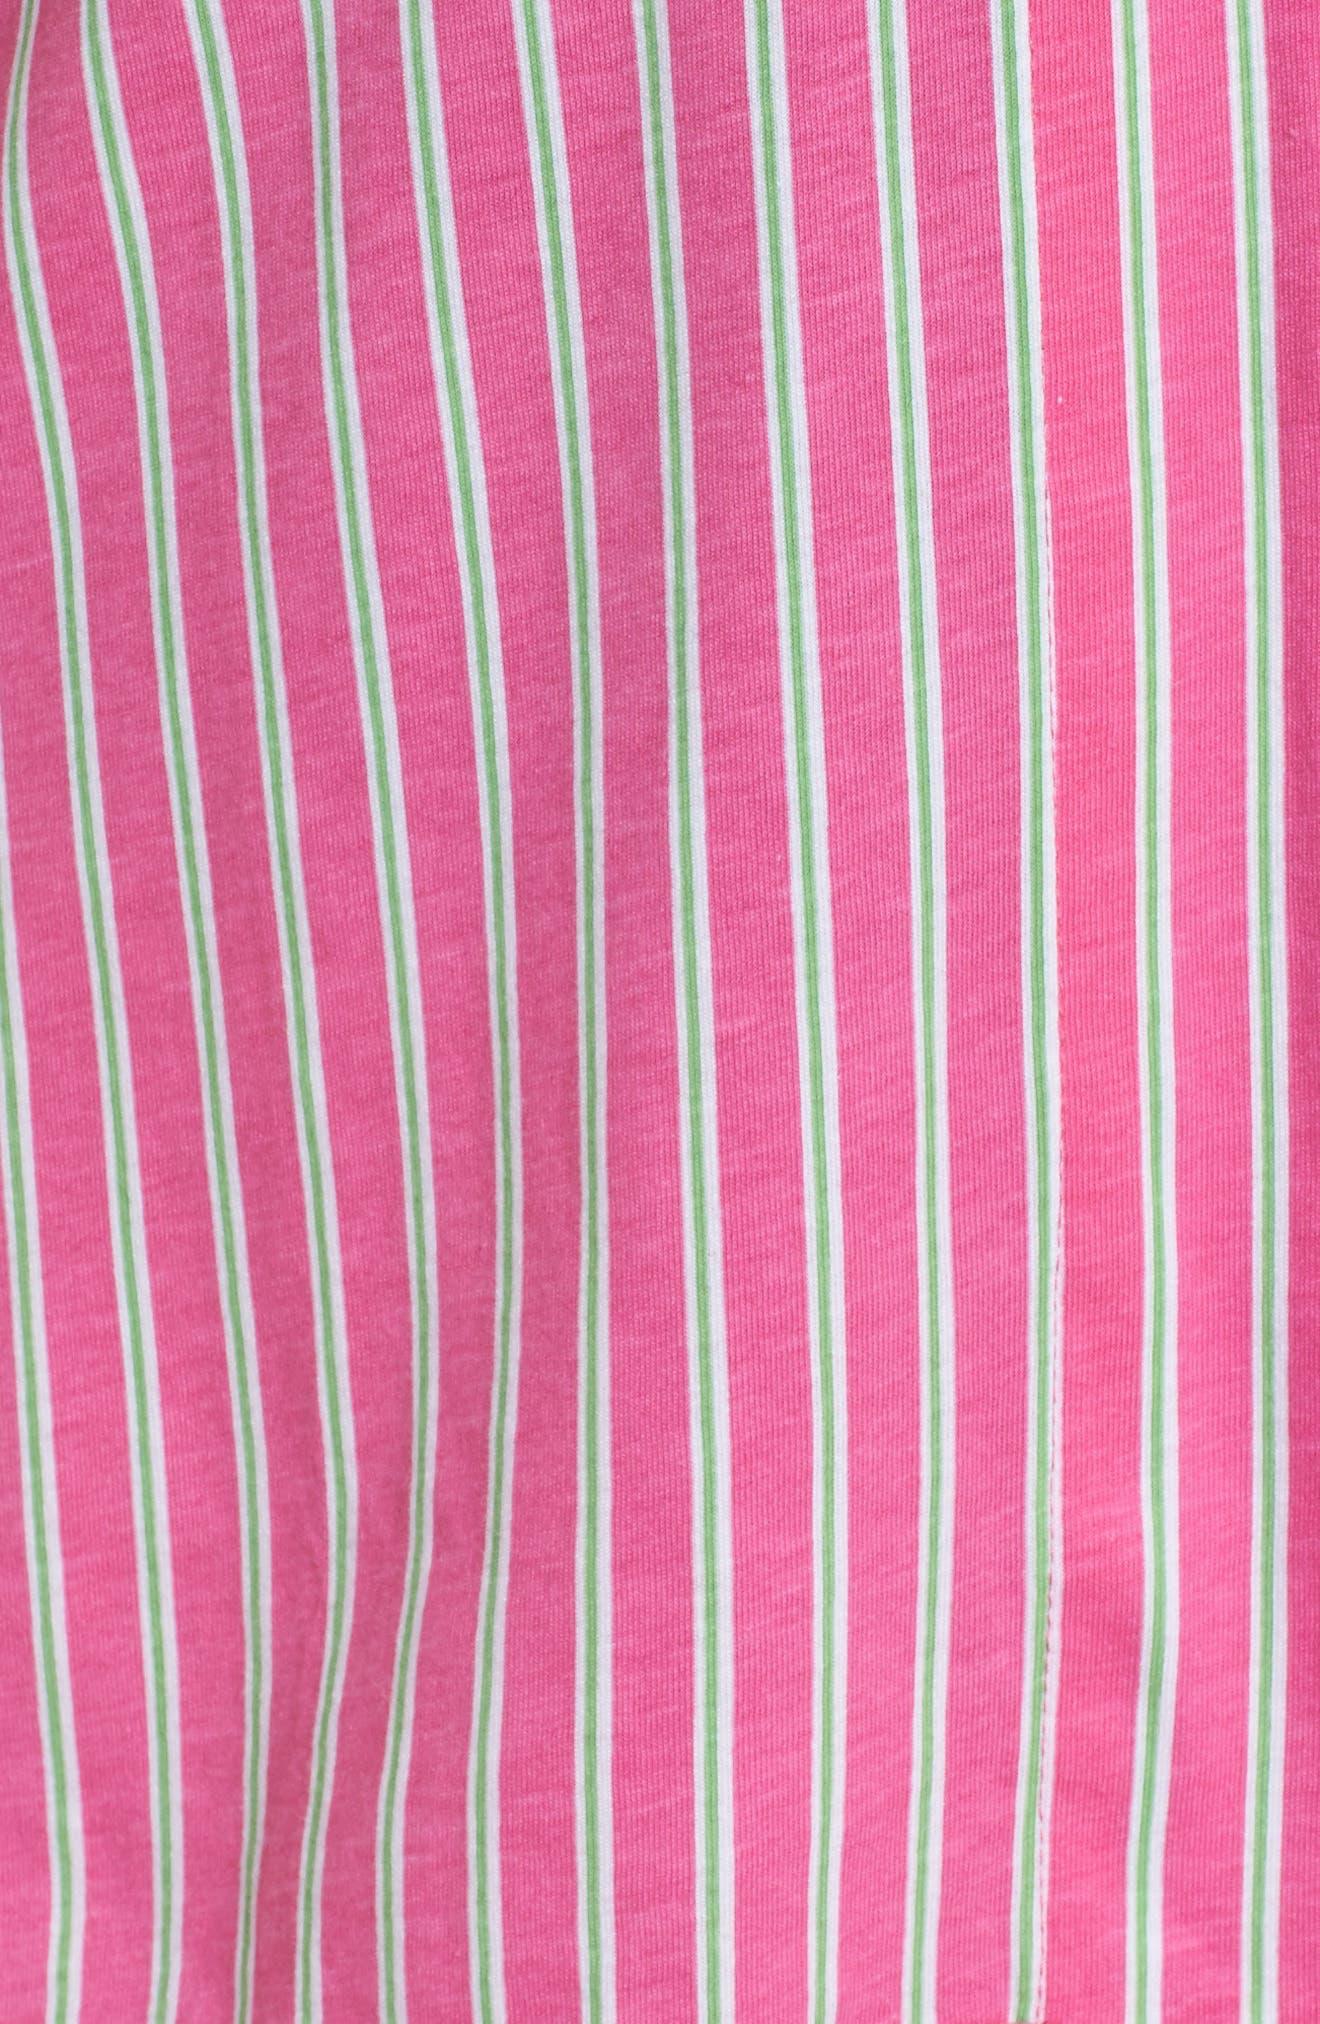 Bermuda Pajamas,                             Alternate thumbnail 5, color,